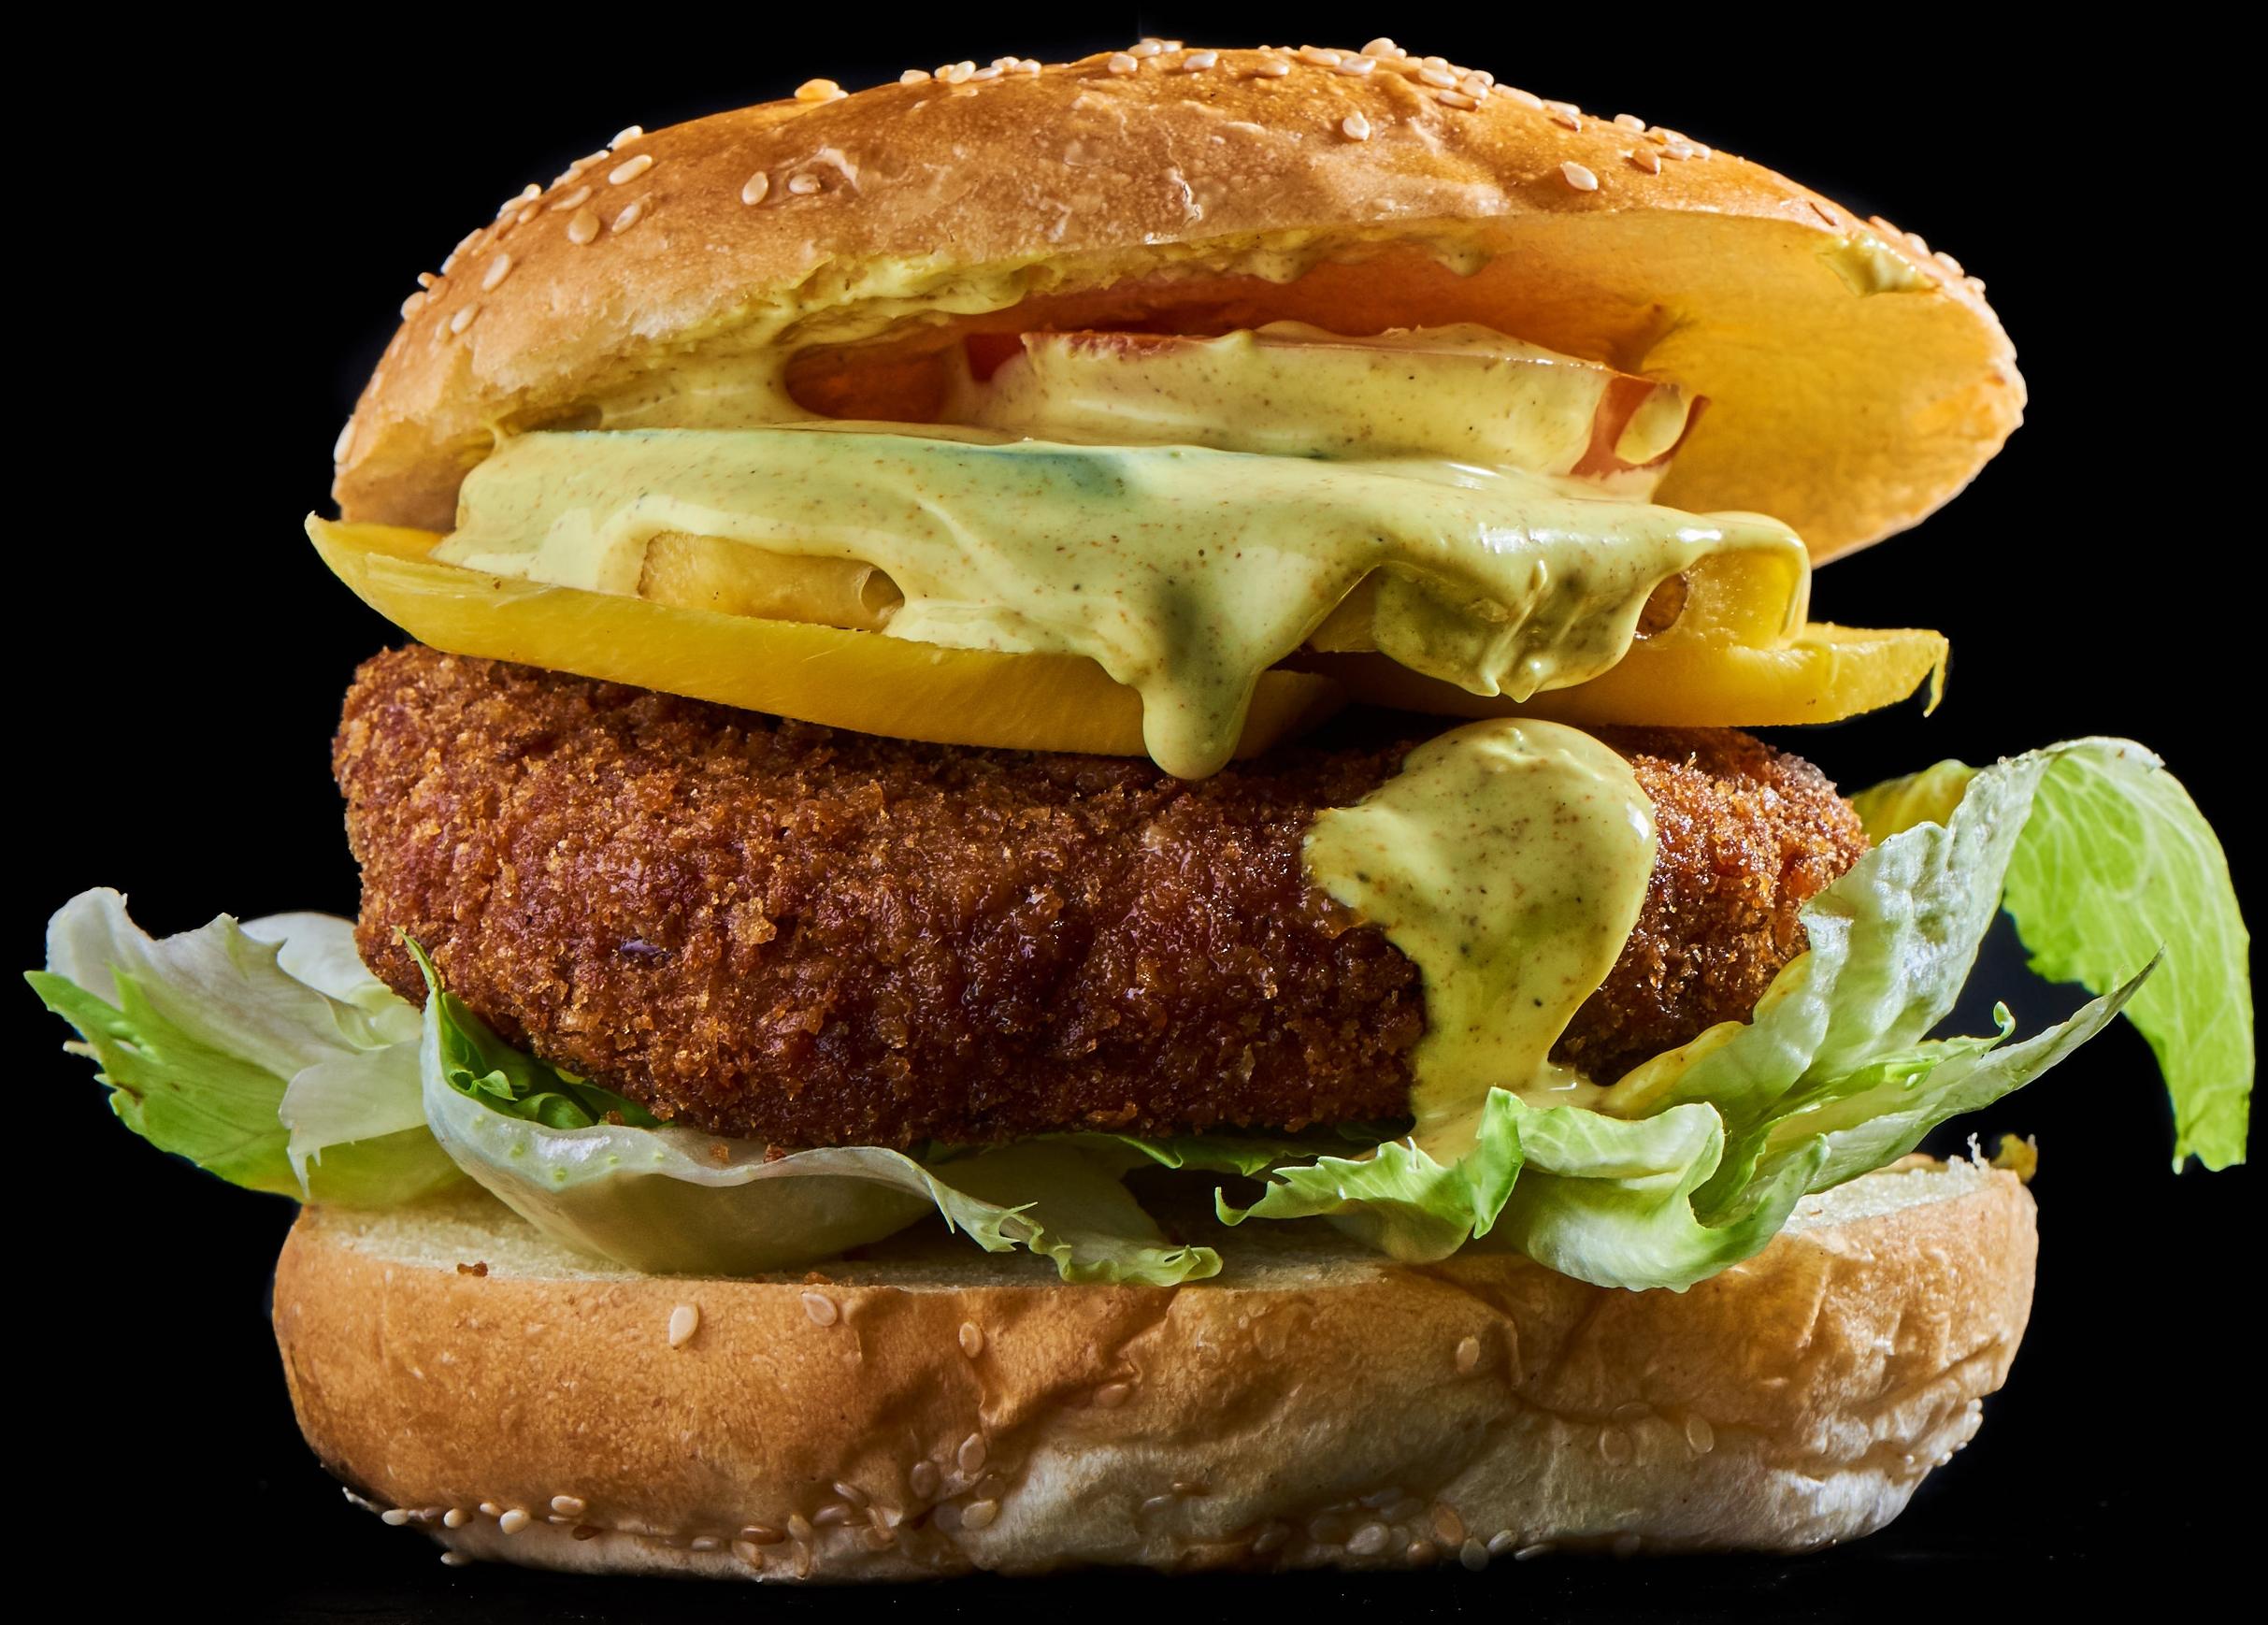 Bollywood Burger - mit grillierter Ananas, Mango, Curry-Mayo, Eisbergsalat, Salatgurke und Tomate15.70